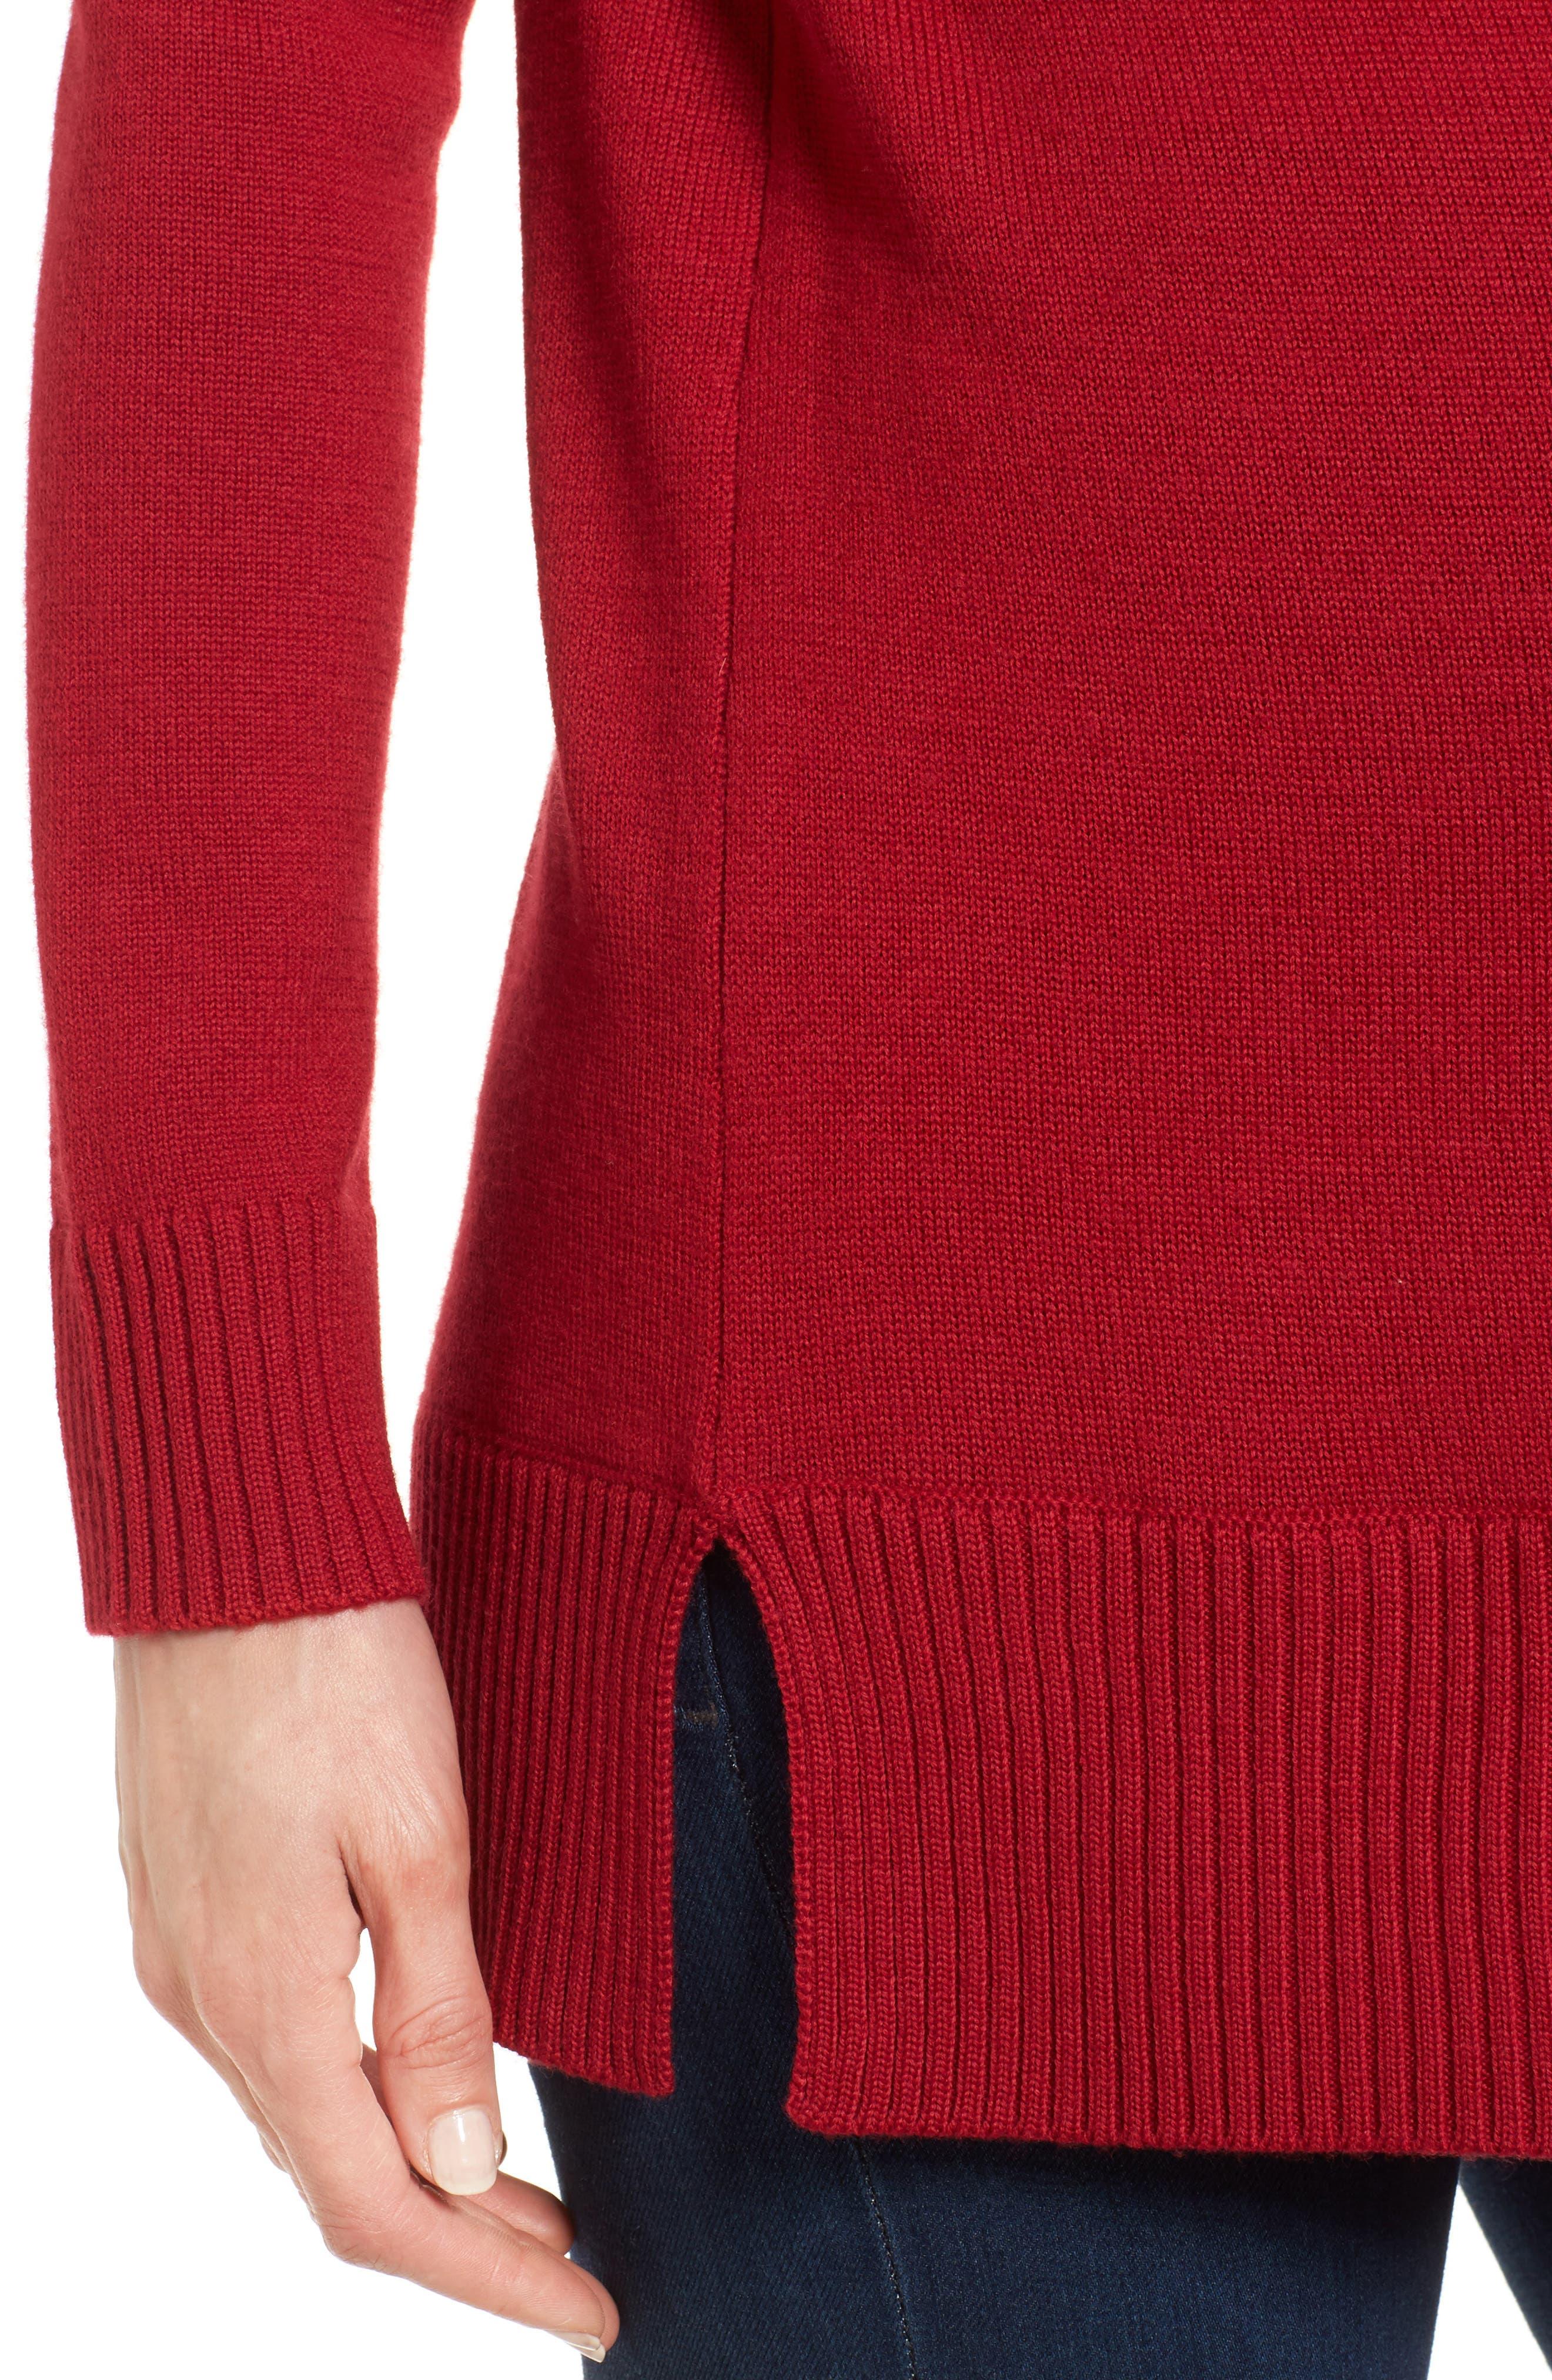 Tessa Turtleneck Wool Maternity Sweater,                             Alternate thumbnail 4, color,                             CARDAMOM RED